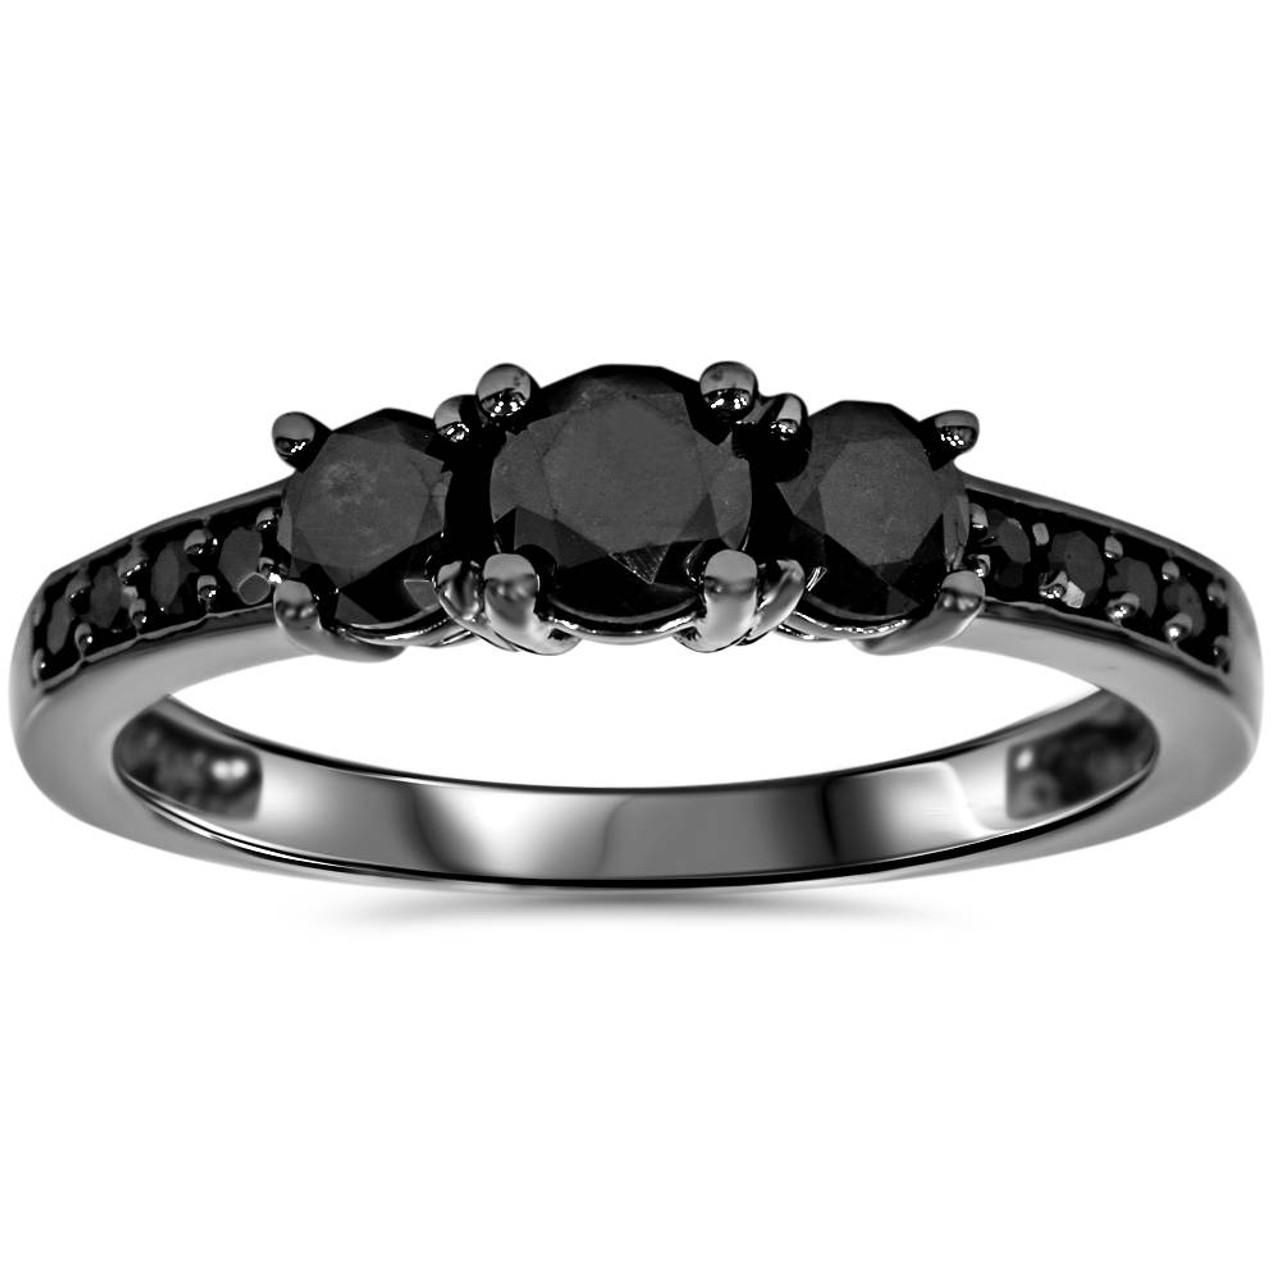 1 1 5ct Heat Treated Black Diamond 3 Stone Ring 10k Black Gold